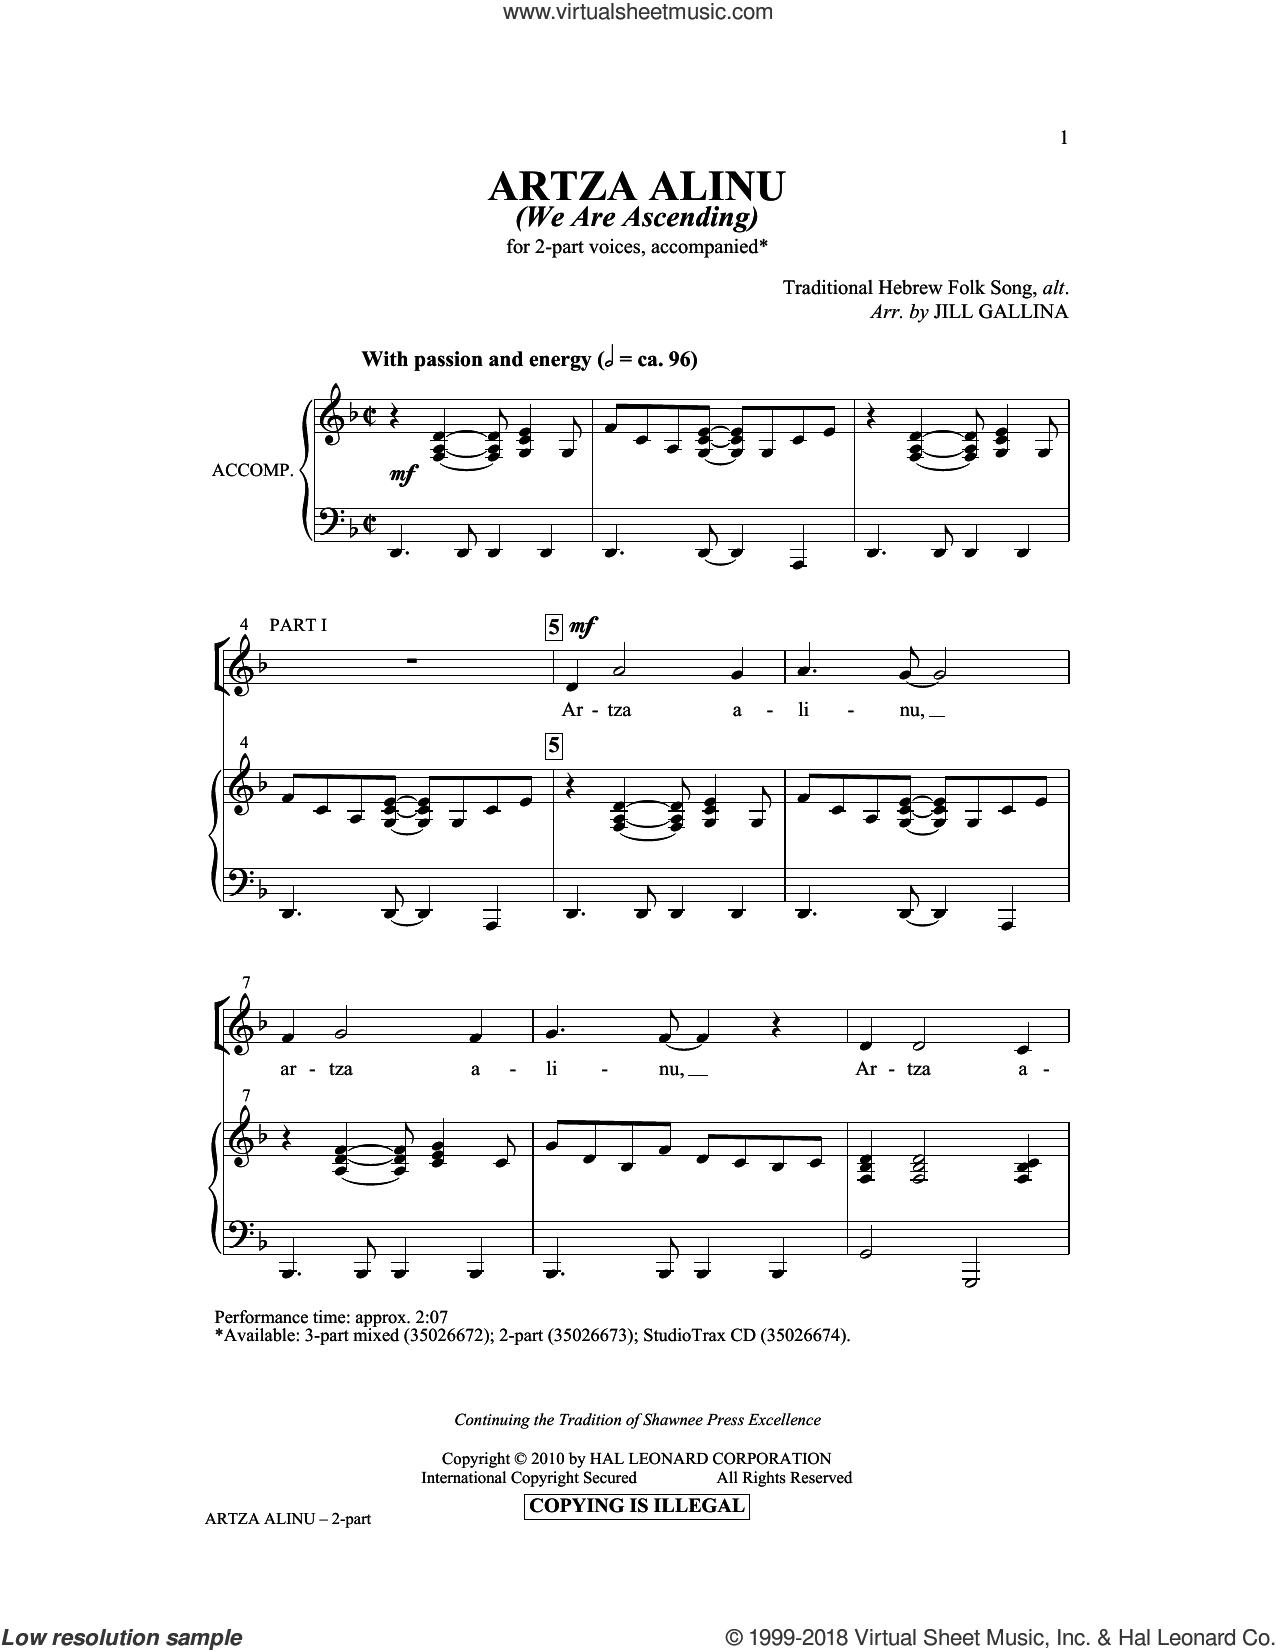 Artza Alinu sheet music for choir (2-Part) by Jill Gallina, intermediate duet